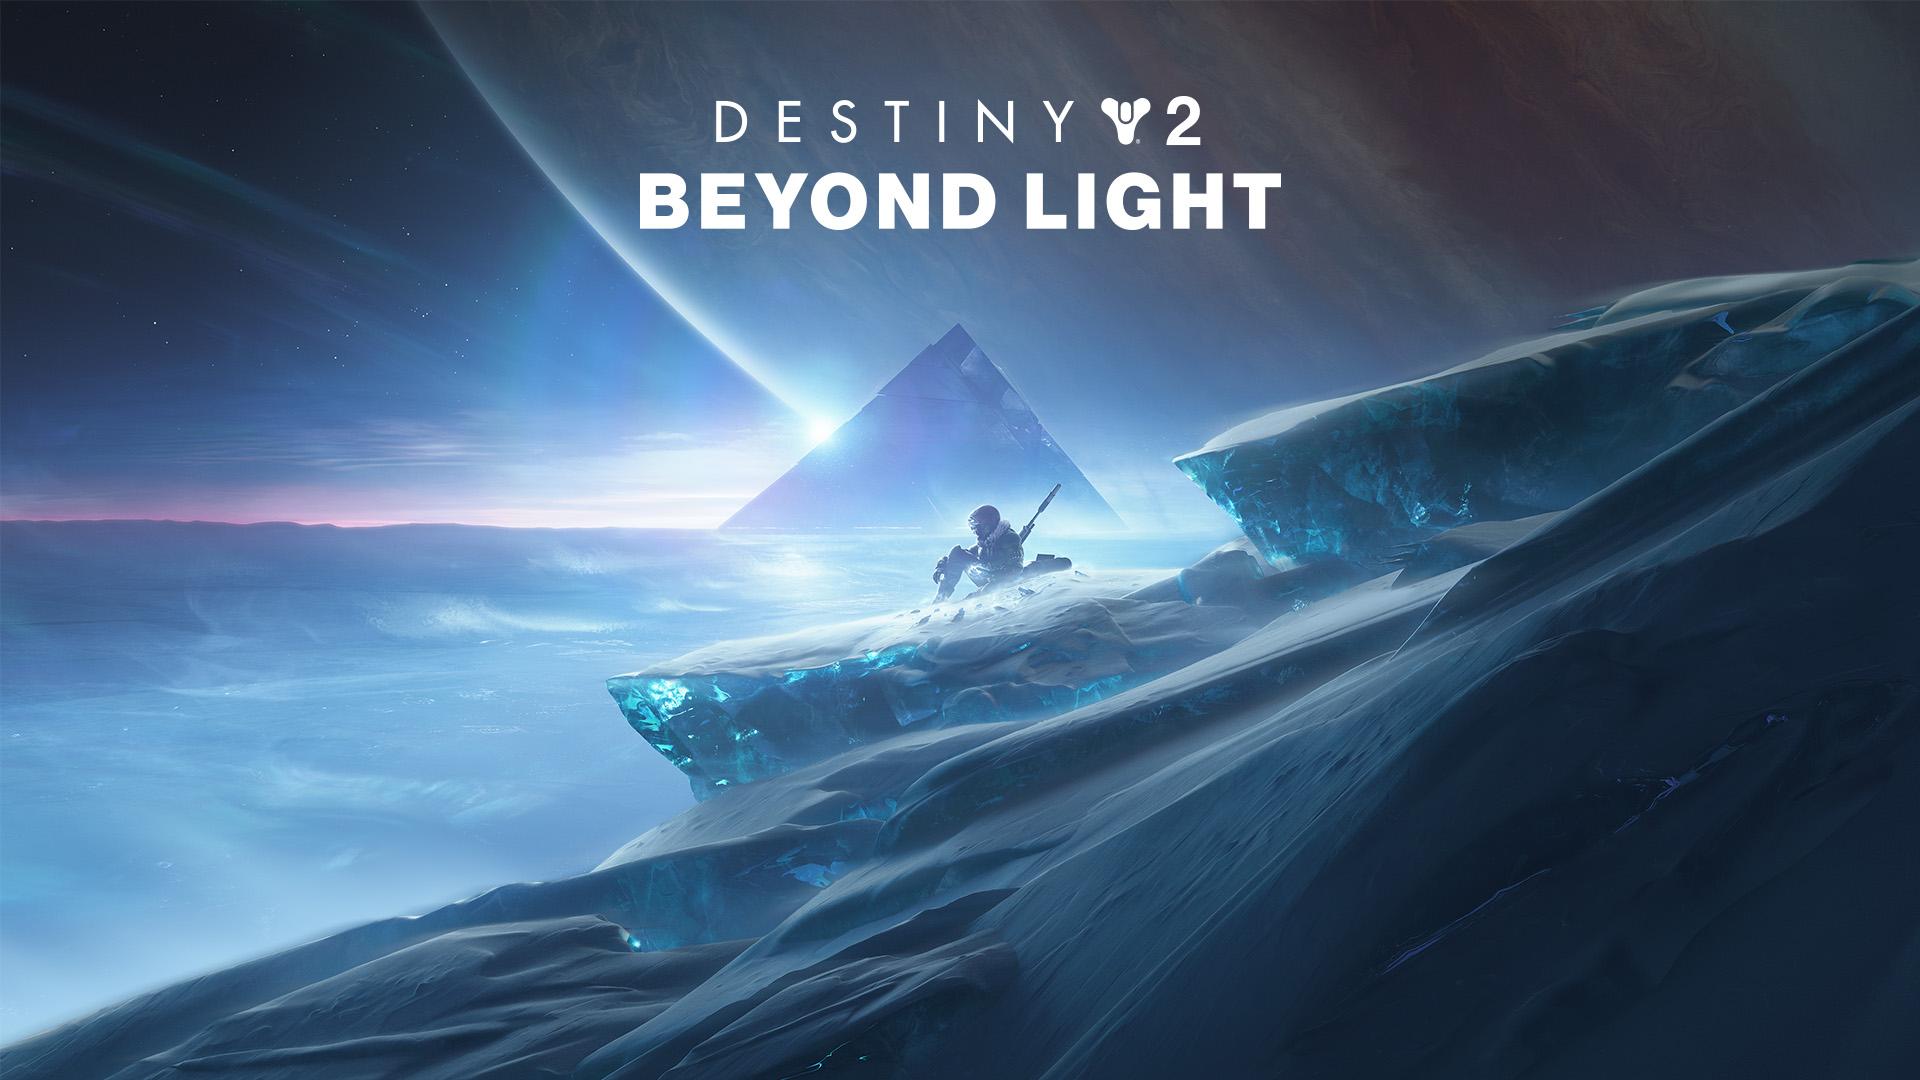 destiny 2 campaign order beyond light